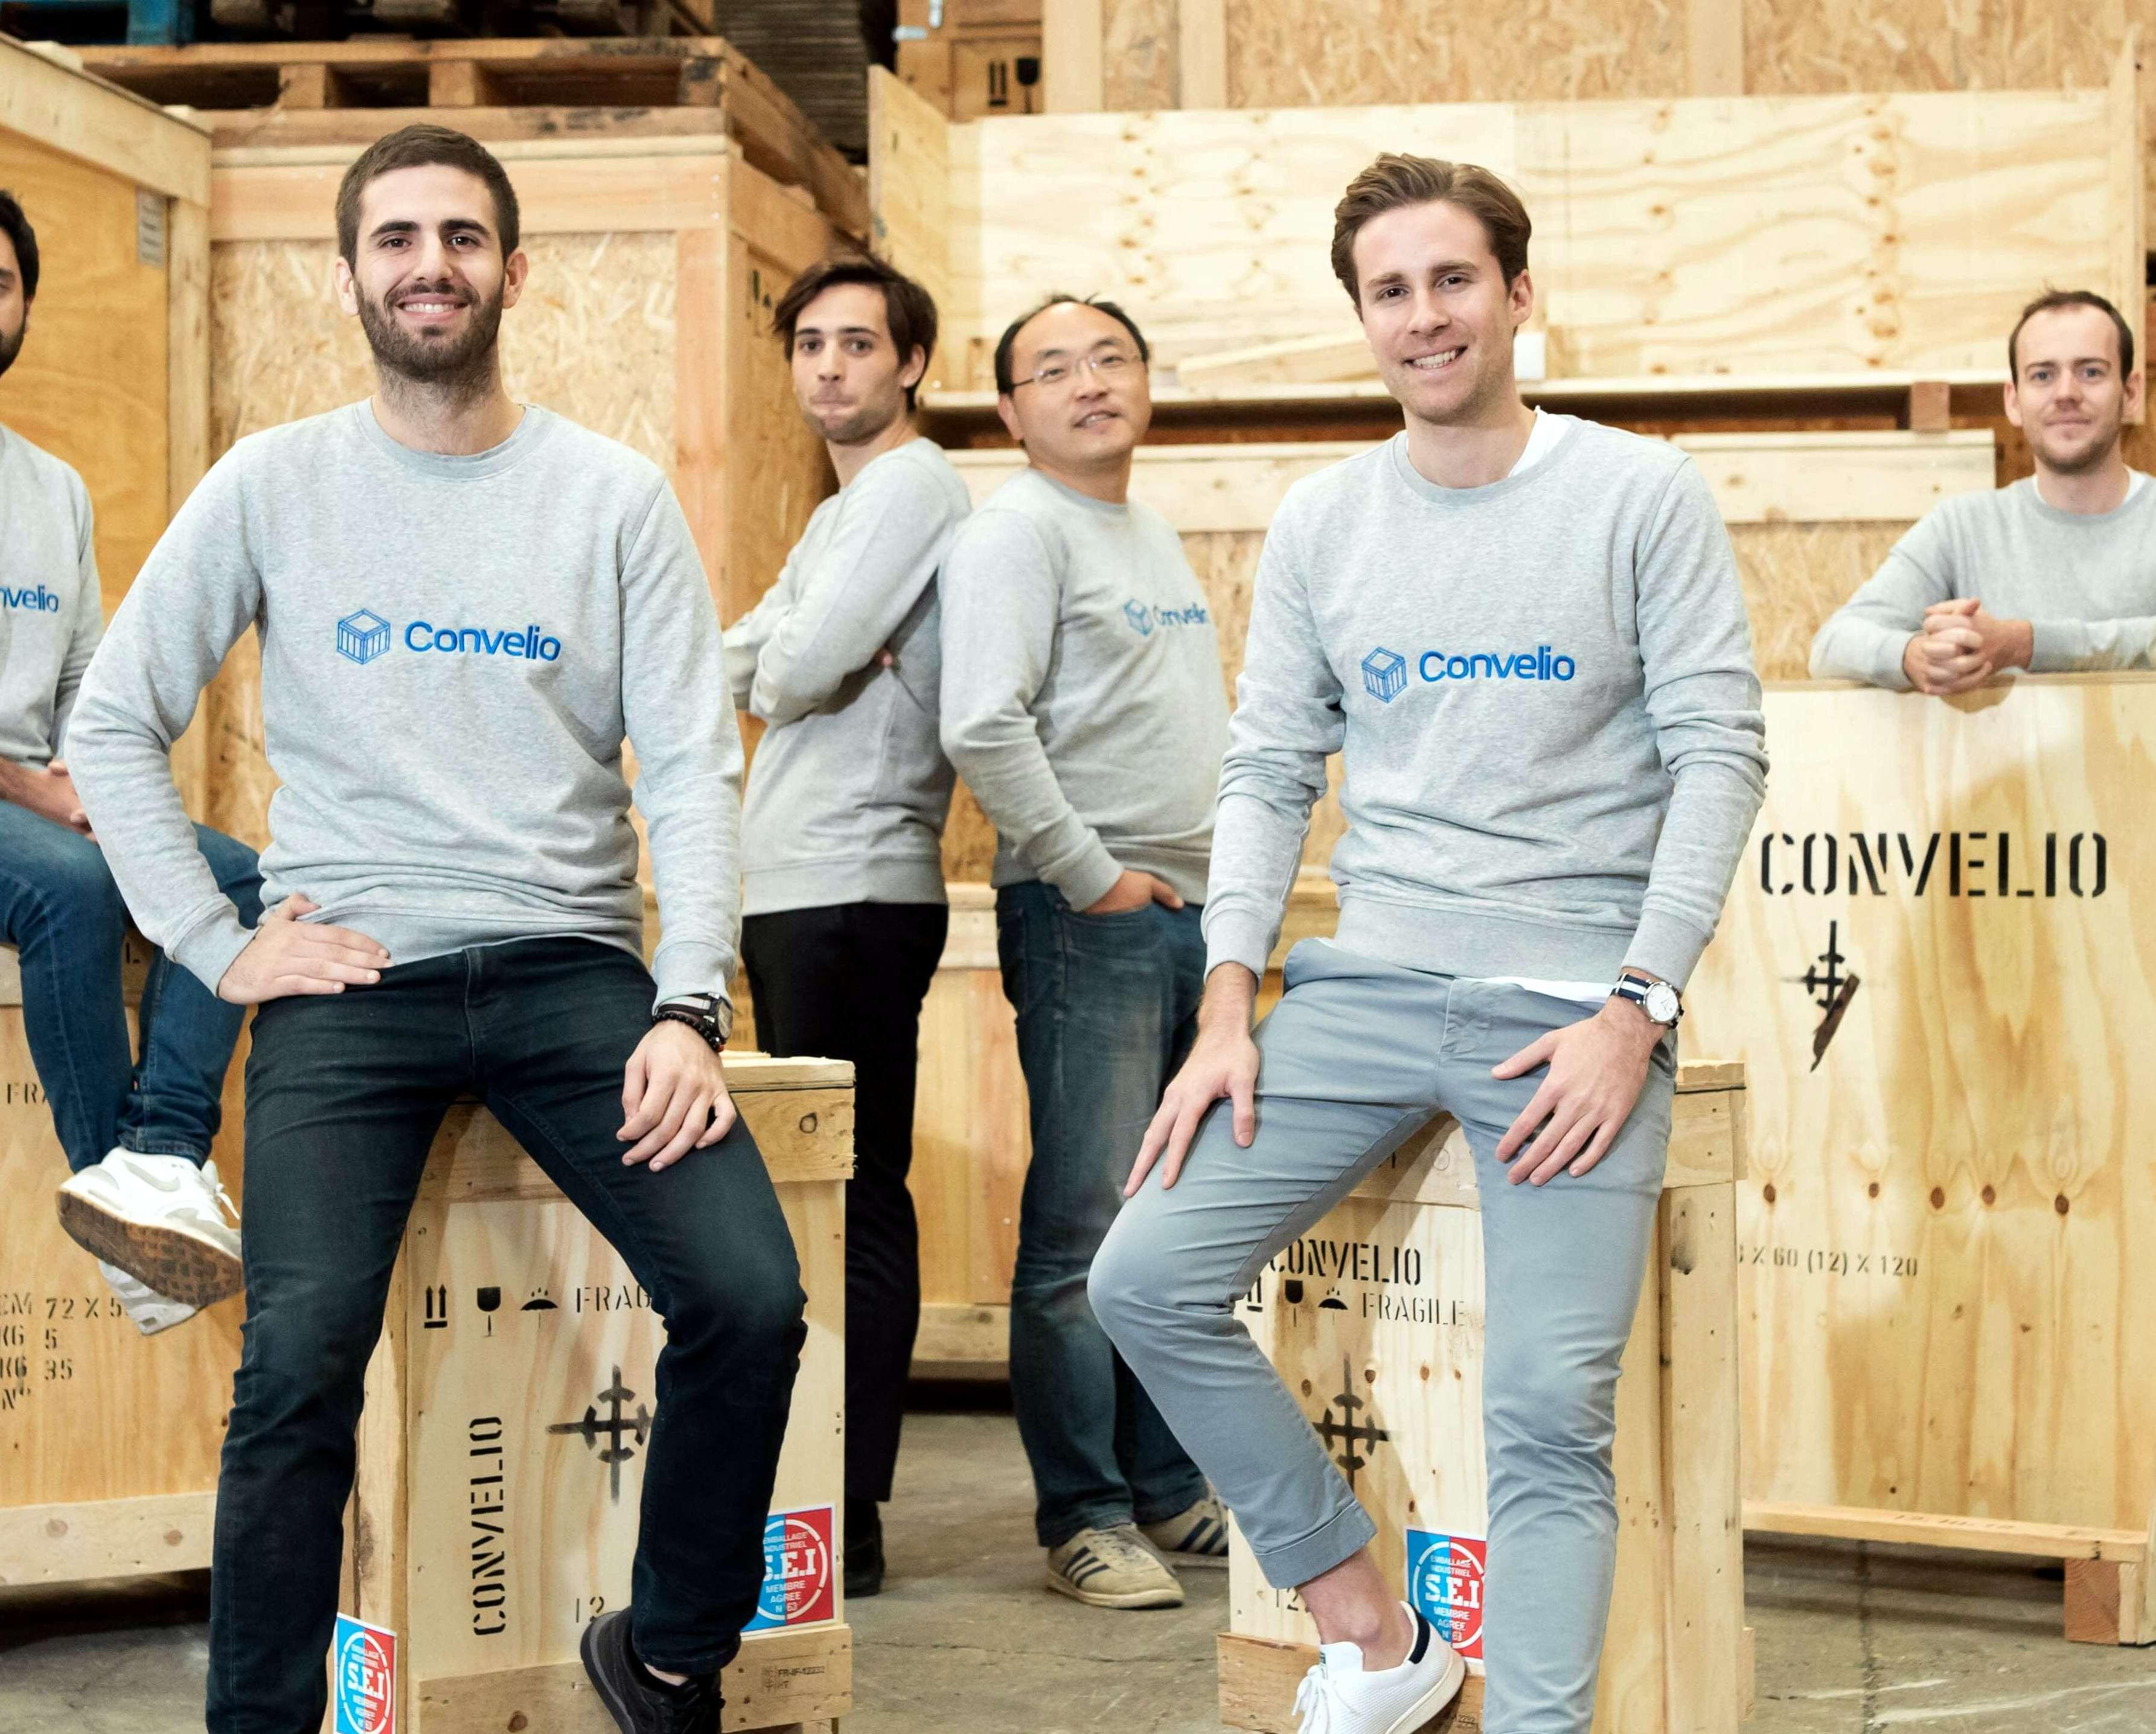 Logistics tech startup Convelio closes €9M ($10M) Series A funding round